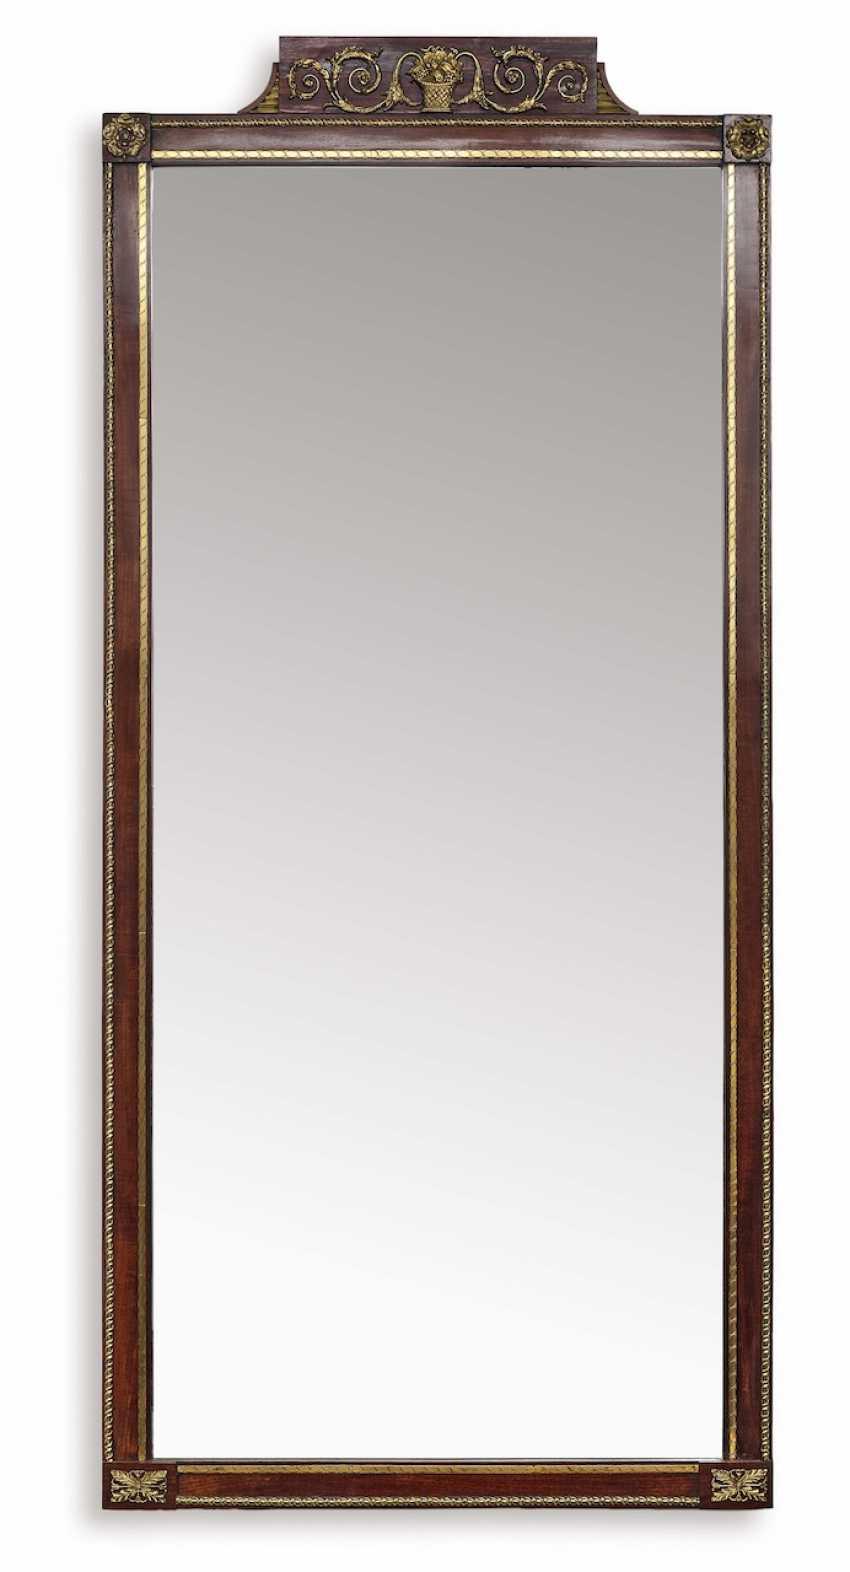 Miroir. La russie, 19. Siècle - photo 1